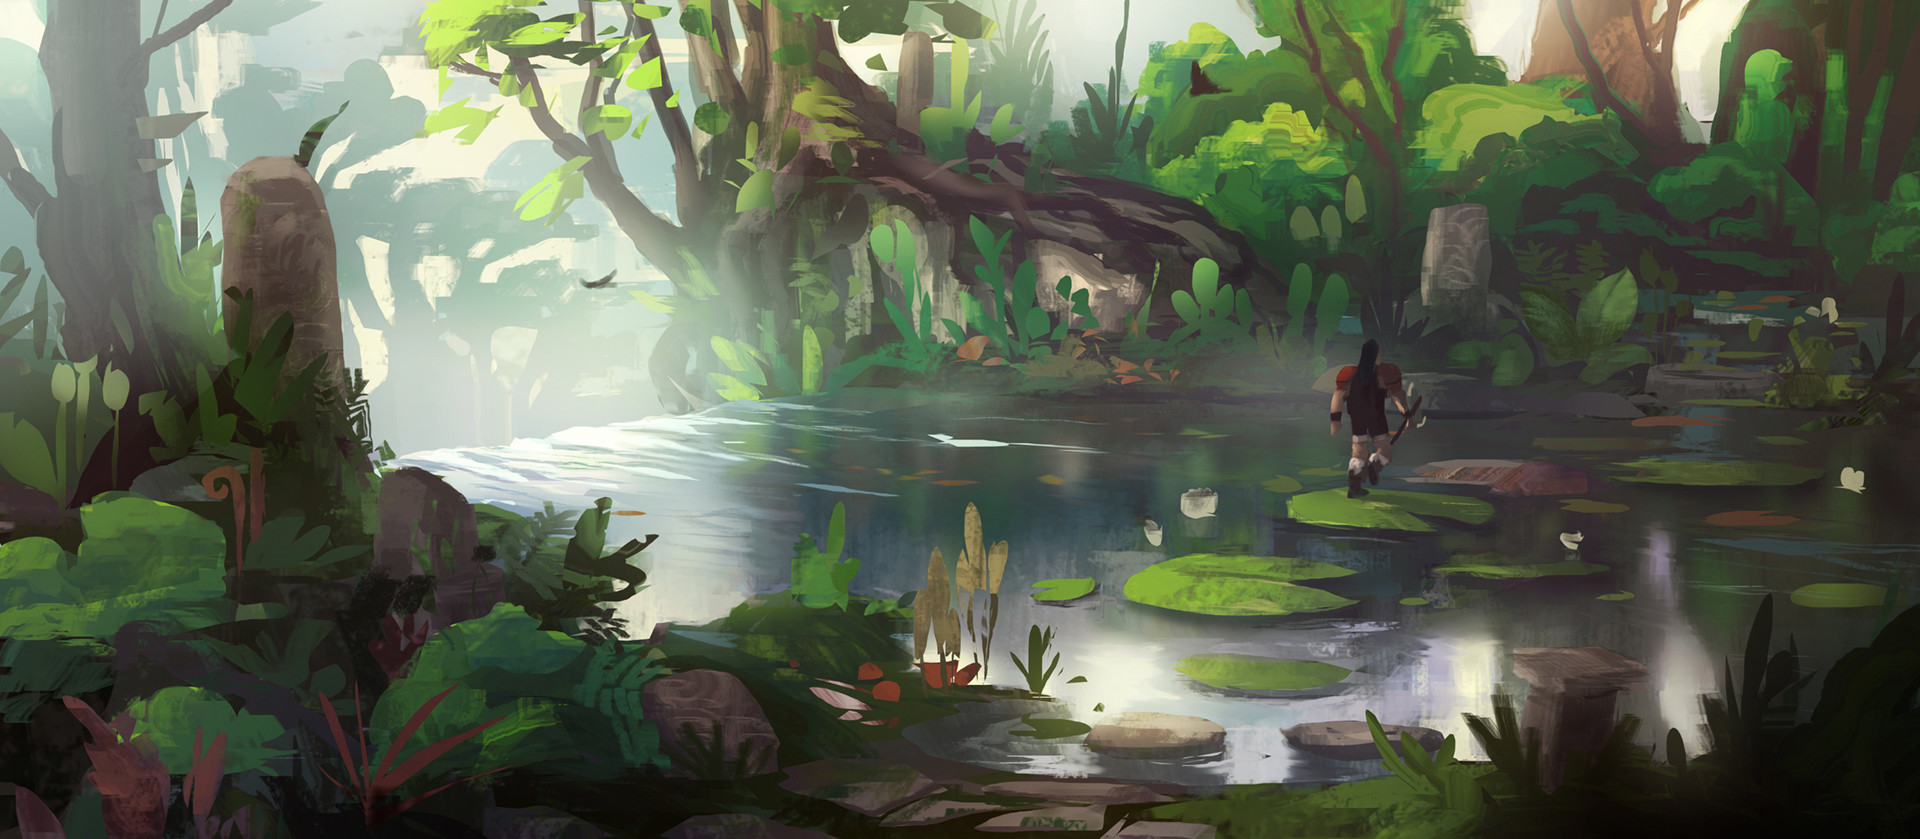 Adrien girod env waterfall 02 72b